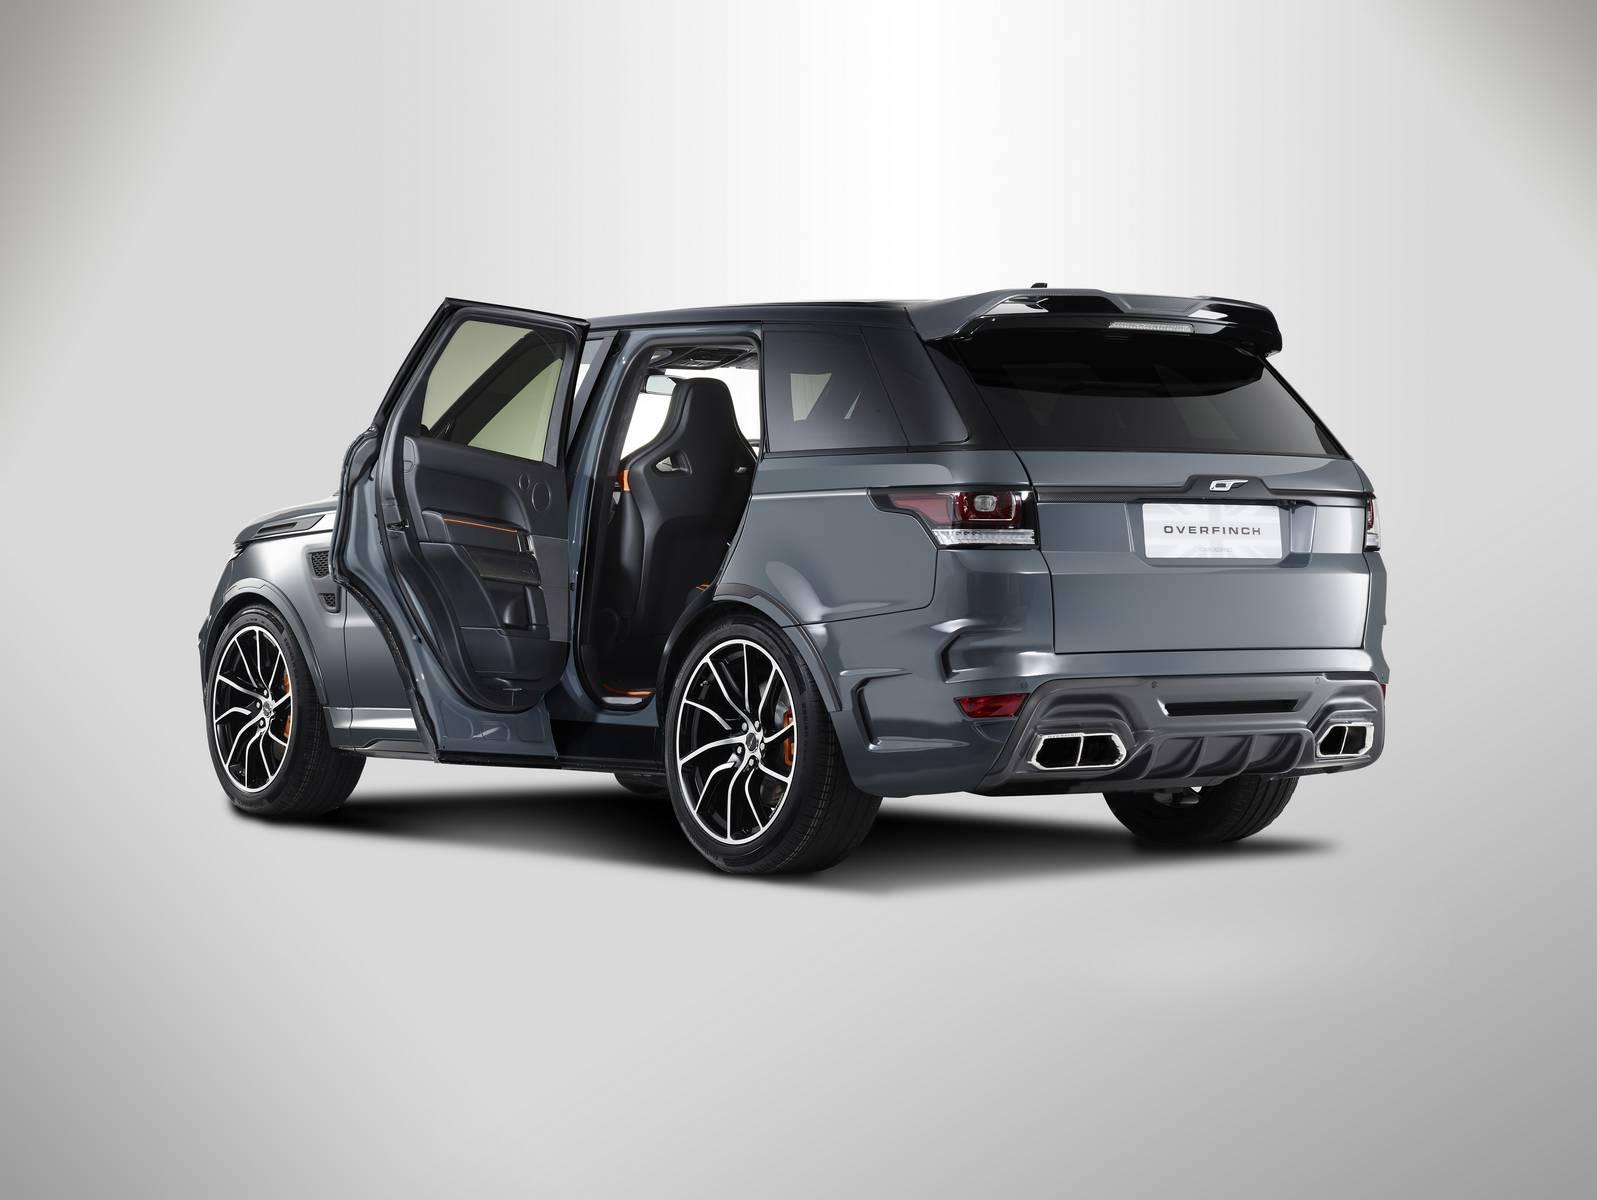 official 2016 range rover supersport by overfinch gtspirit. Black Bedroom Furniture Sets. Home Design Ideas